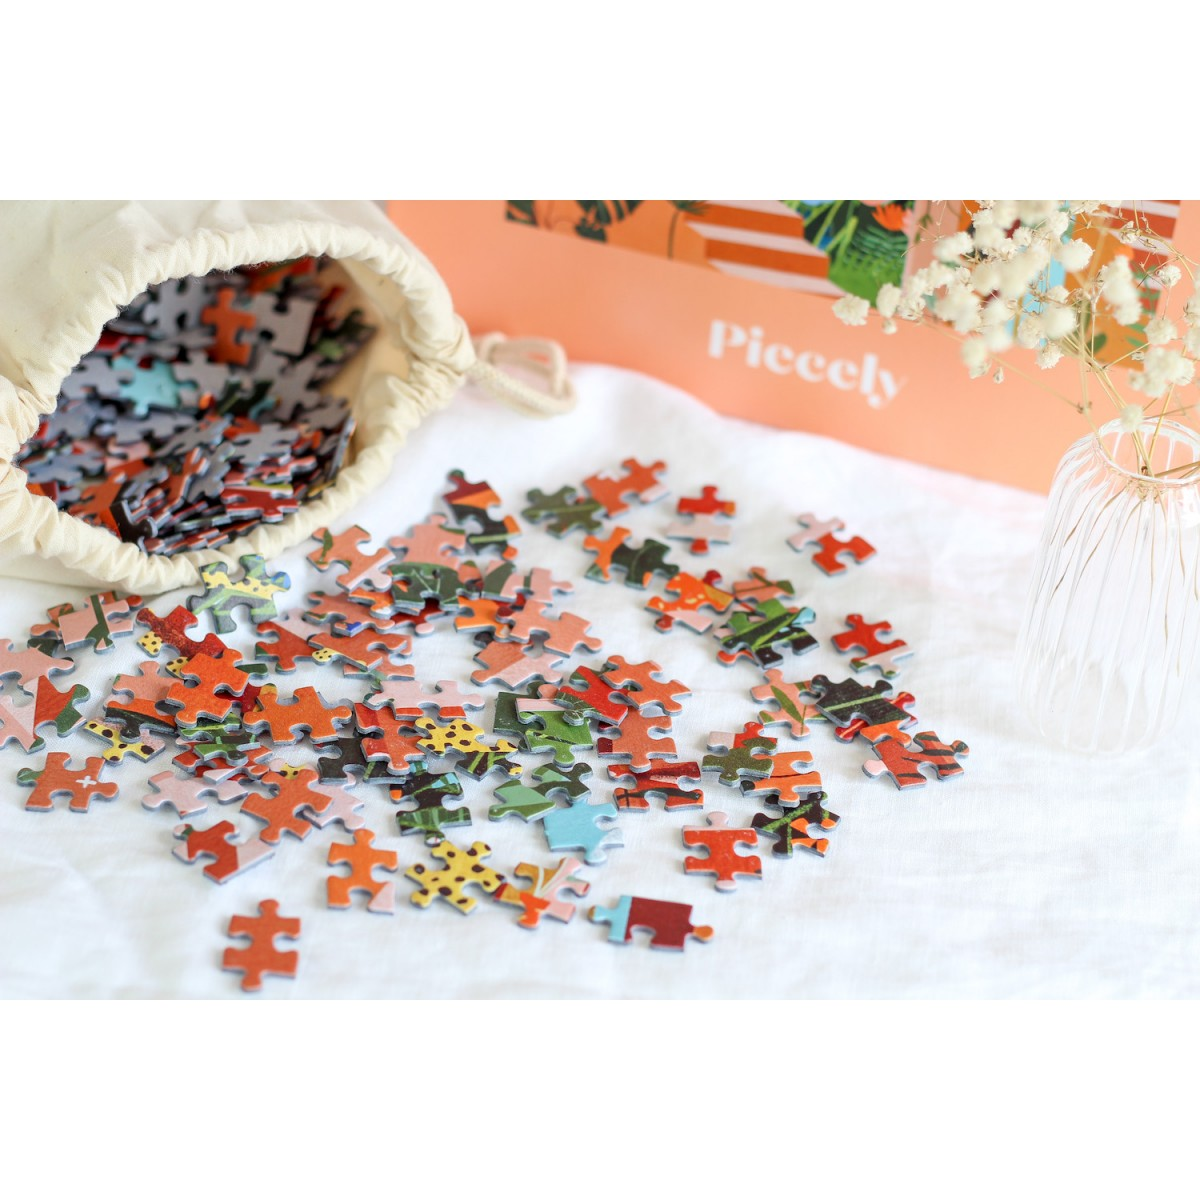 Piecely Feline Kingdom Puzzle, 1000 Teile